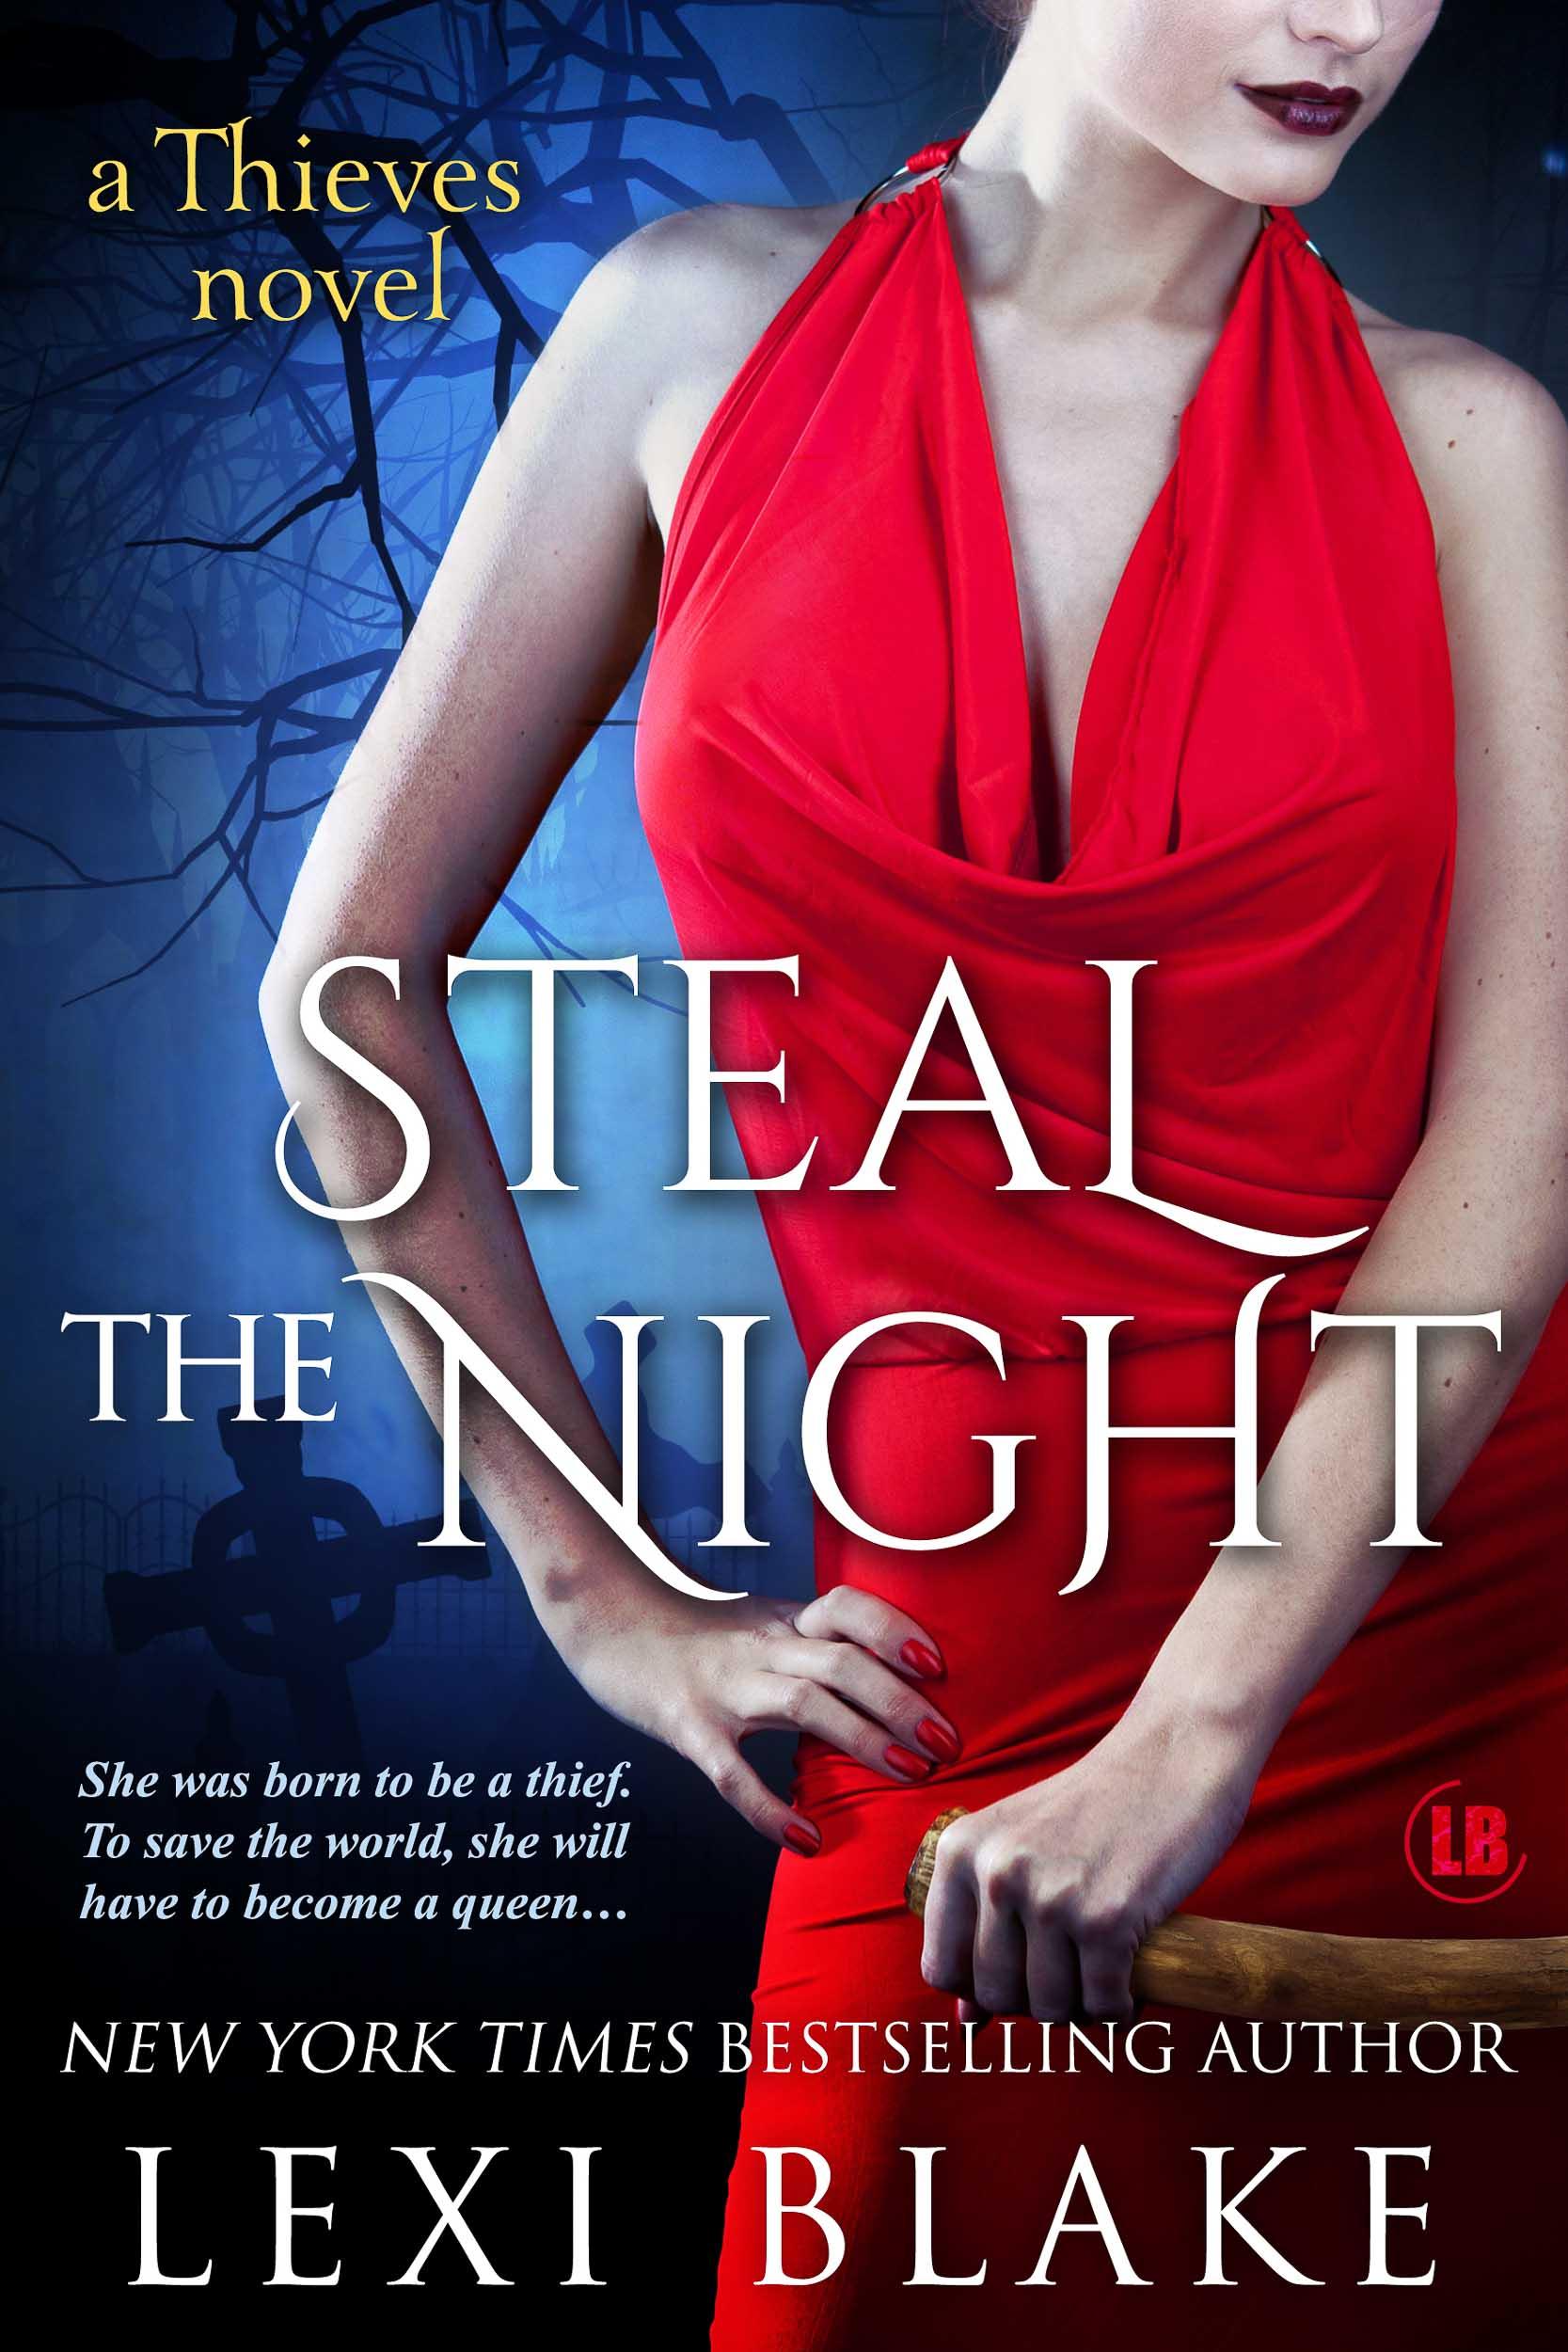 Lexi Blake Steal the Night.jpg